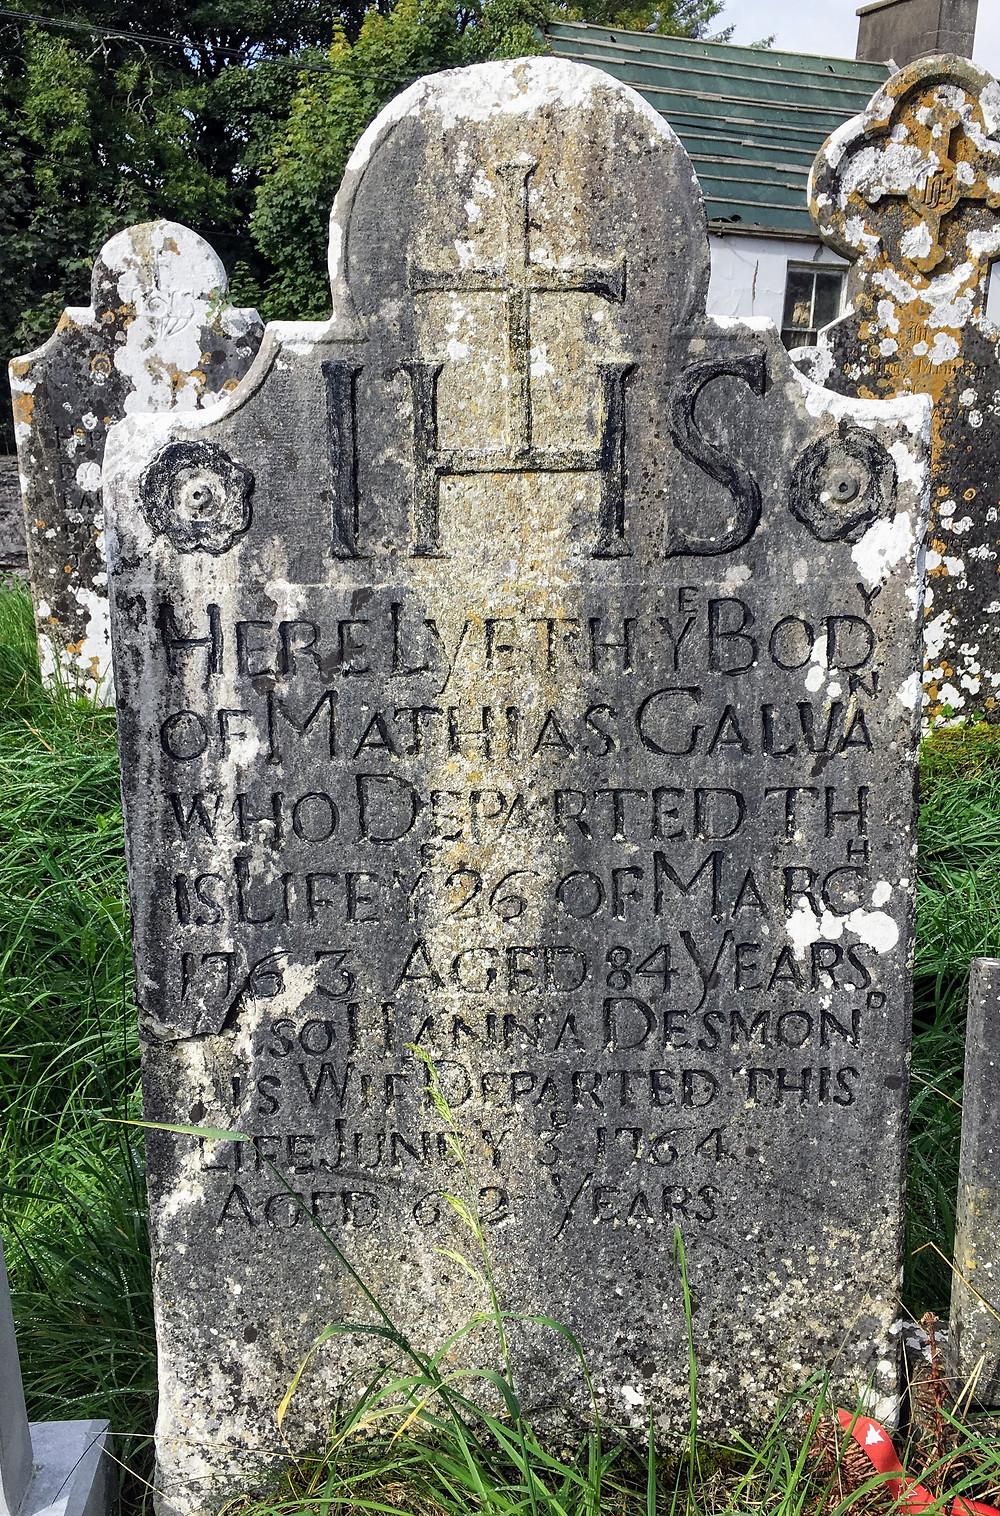 Ruins Remains of Saint Mary's RC Church Ireland graveyard gravestone